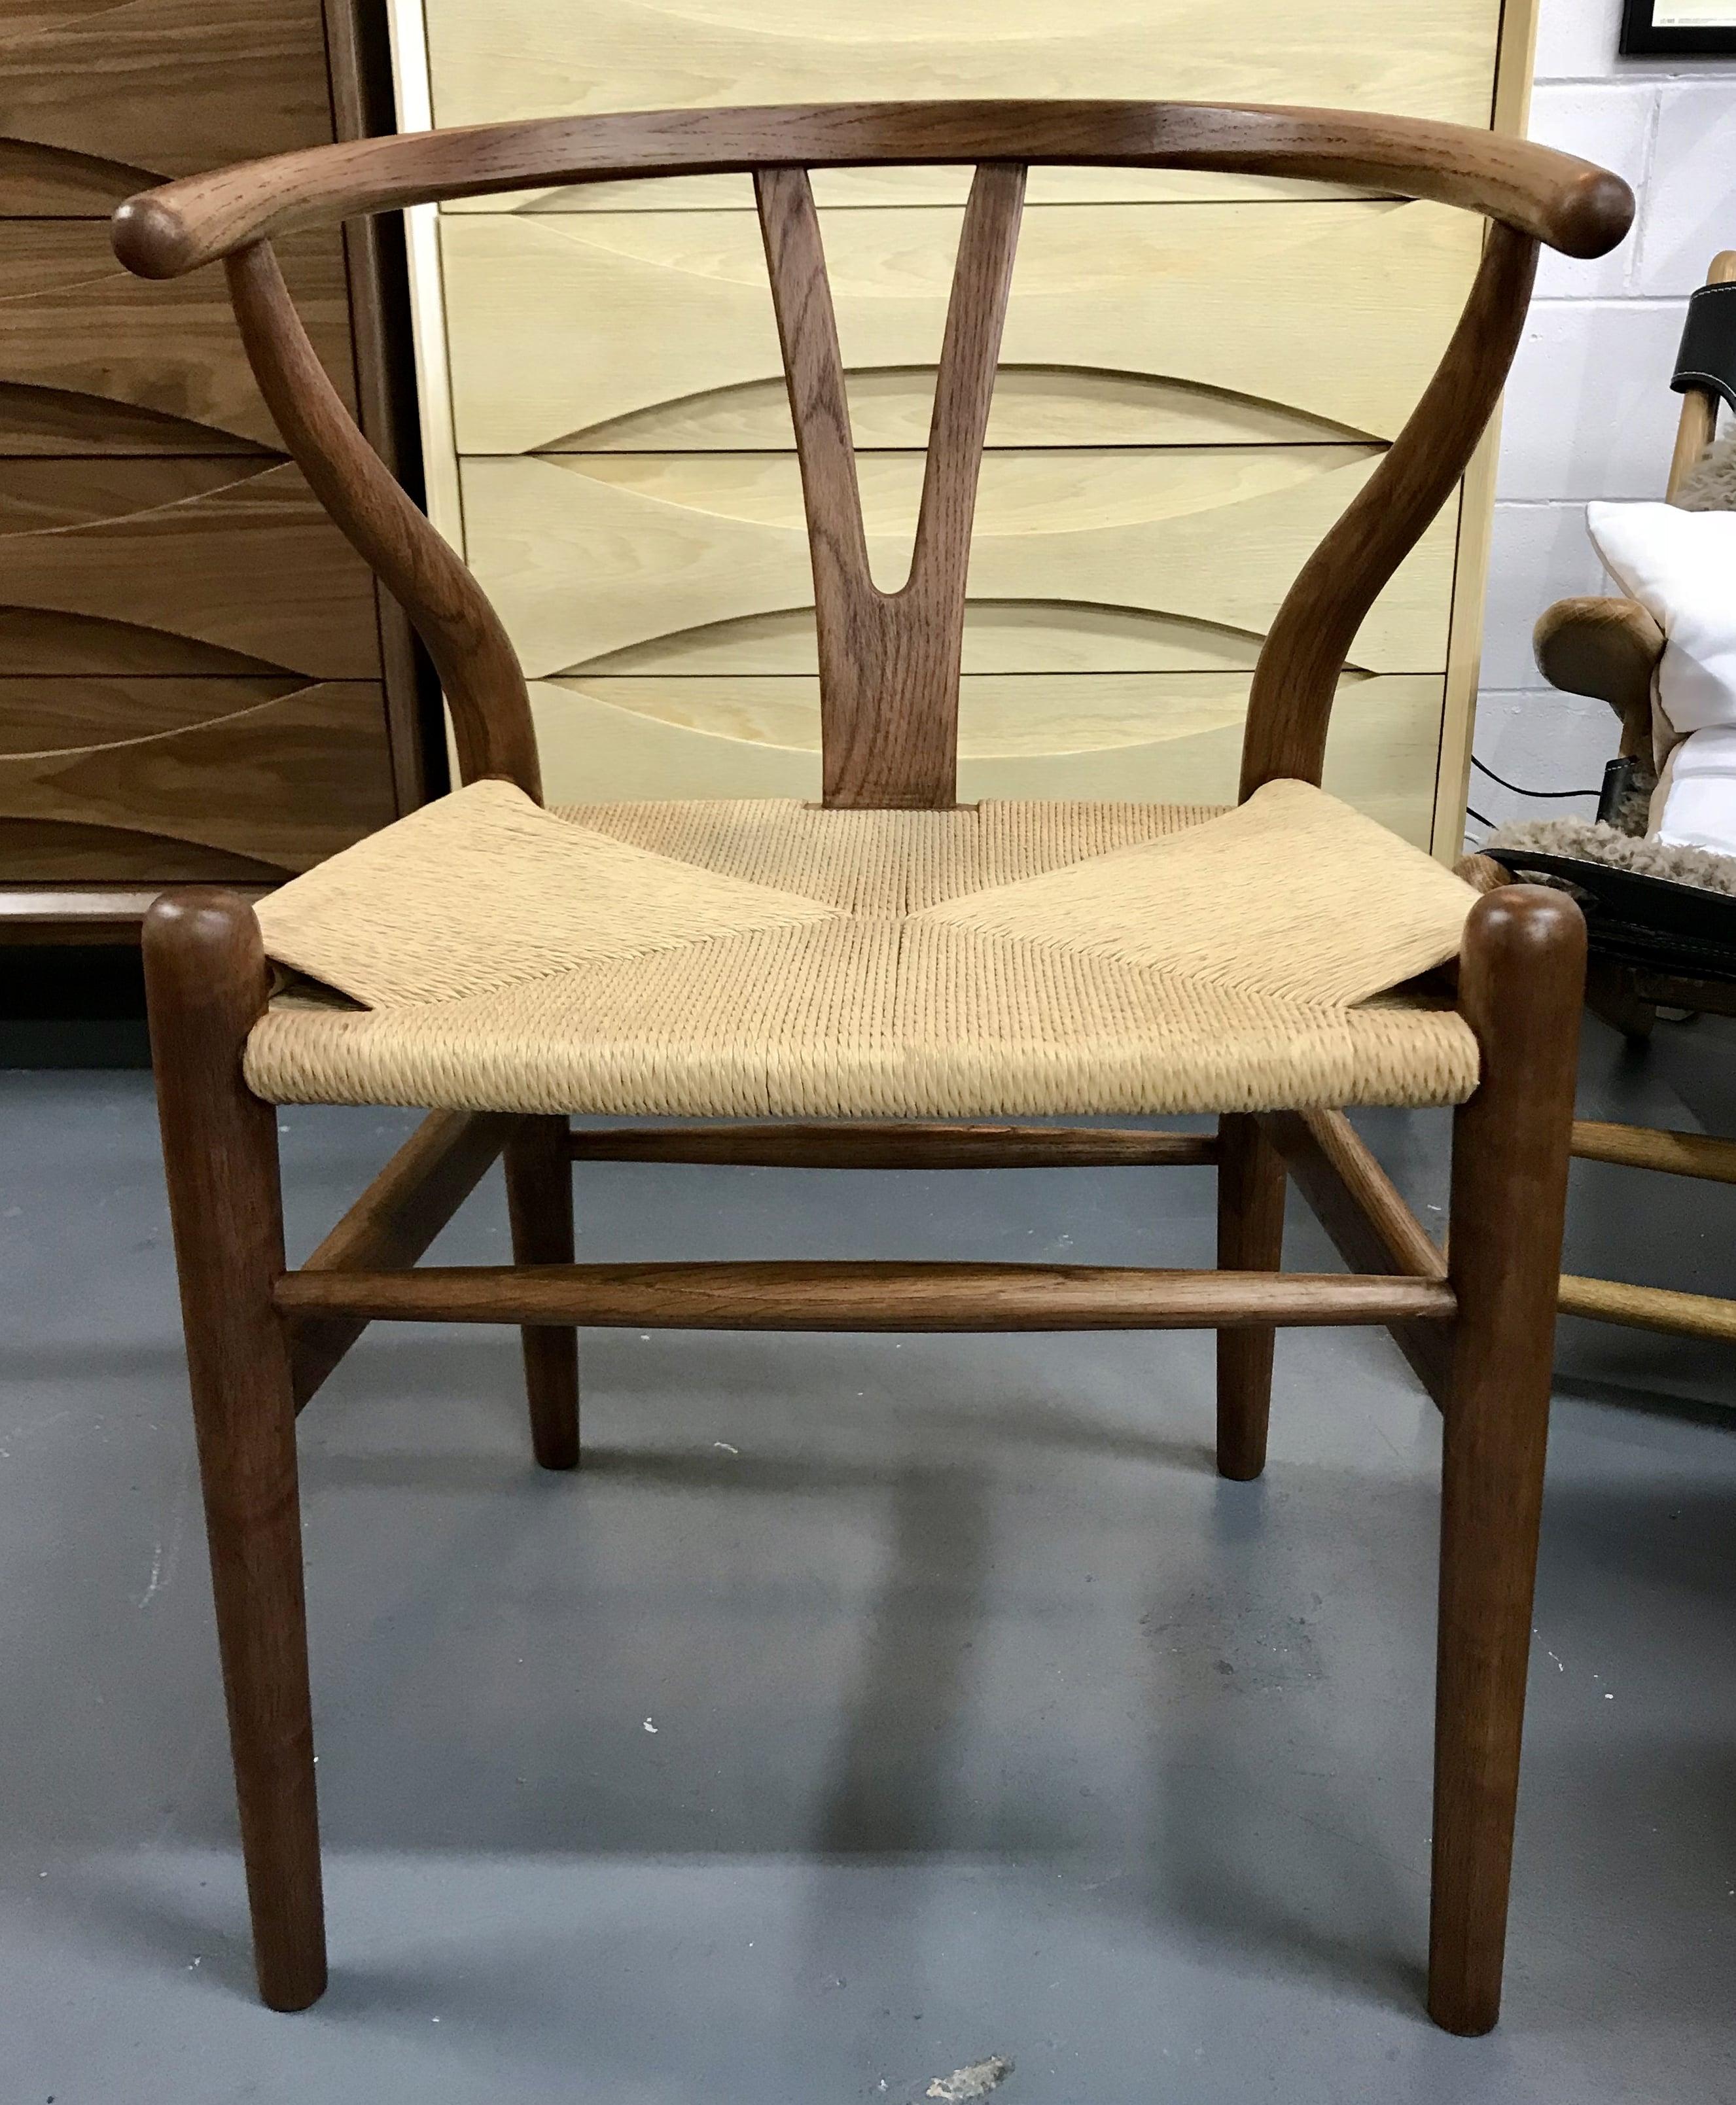 chair slipcovers nz cover rentals memphis wishbone chairs for sale hans j wegner carl hansen san